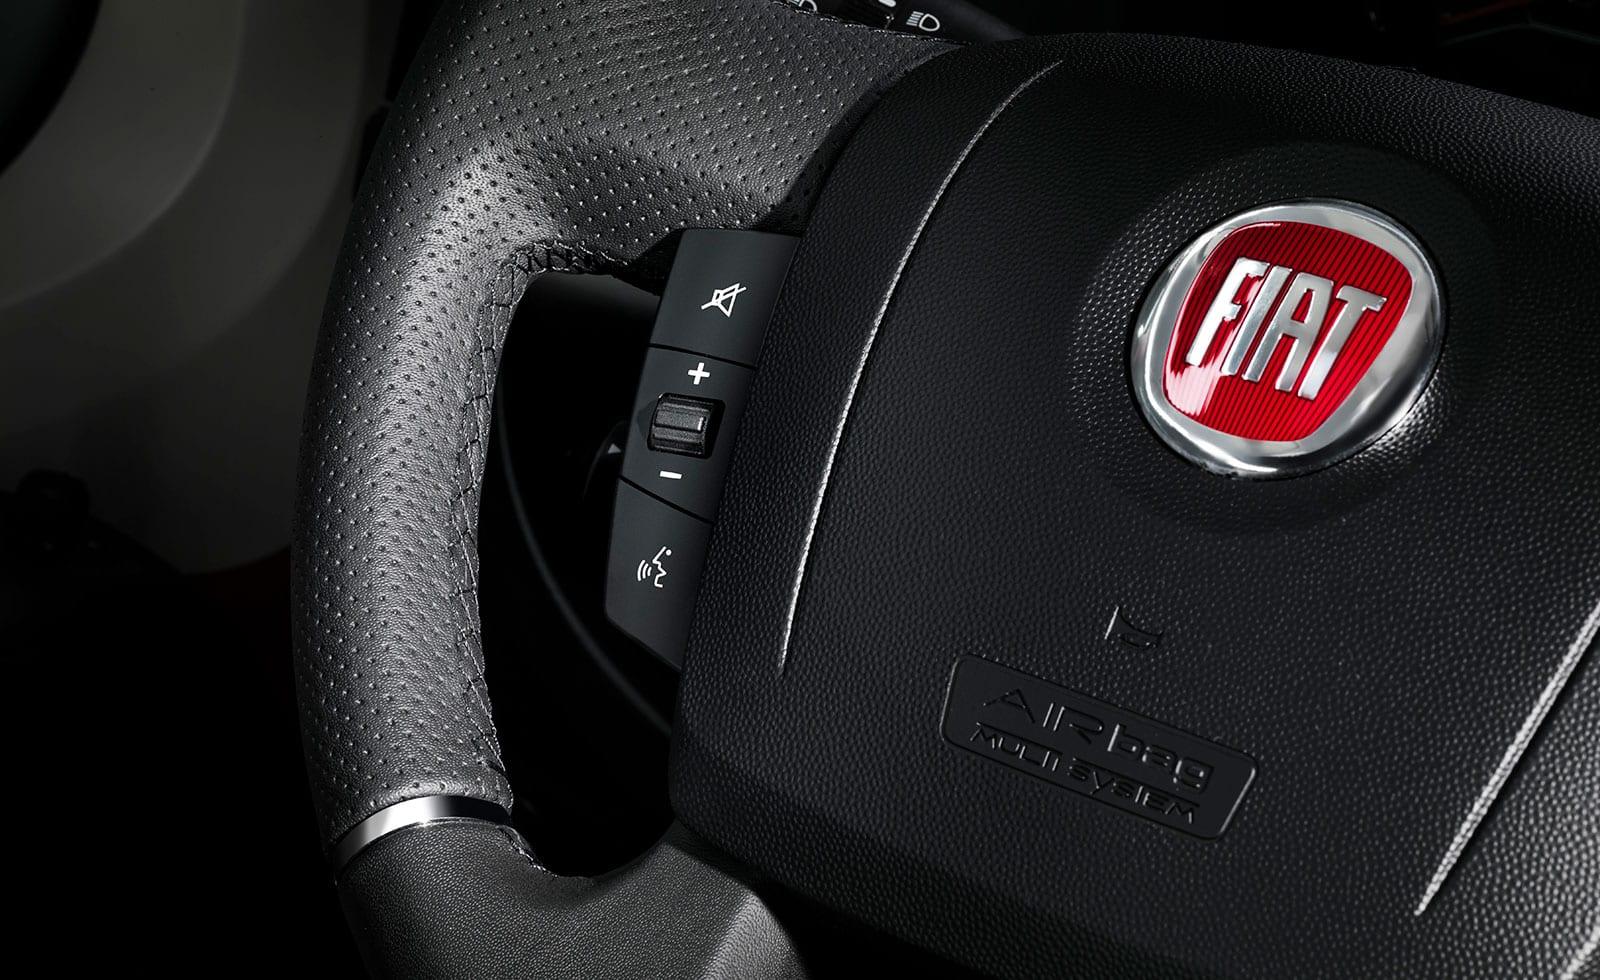 Fiat Professional Ducato Luxury pro - stuurbediening